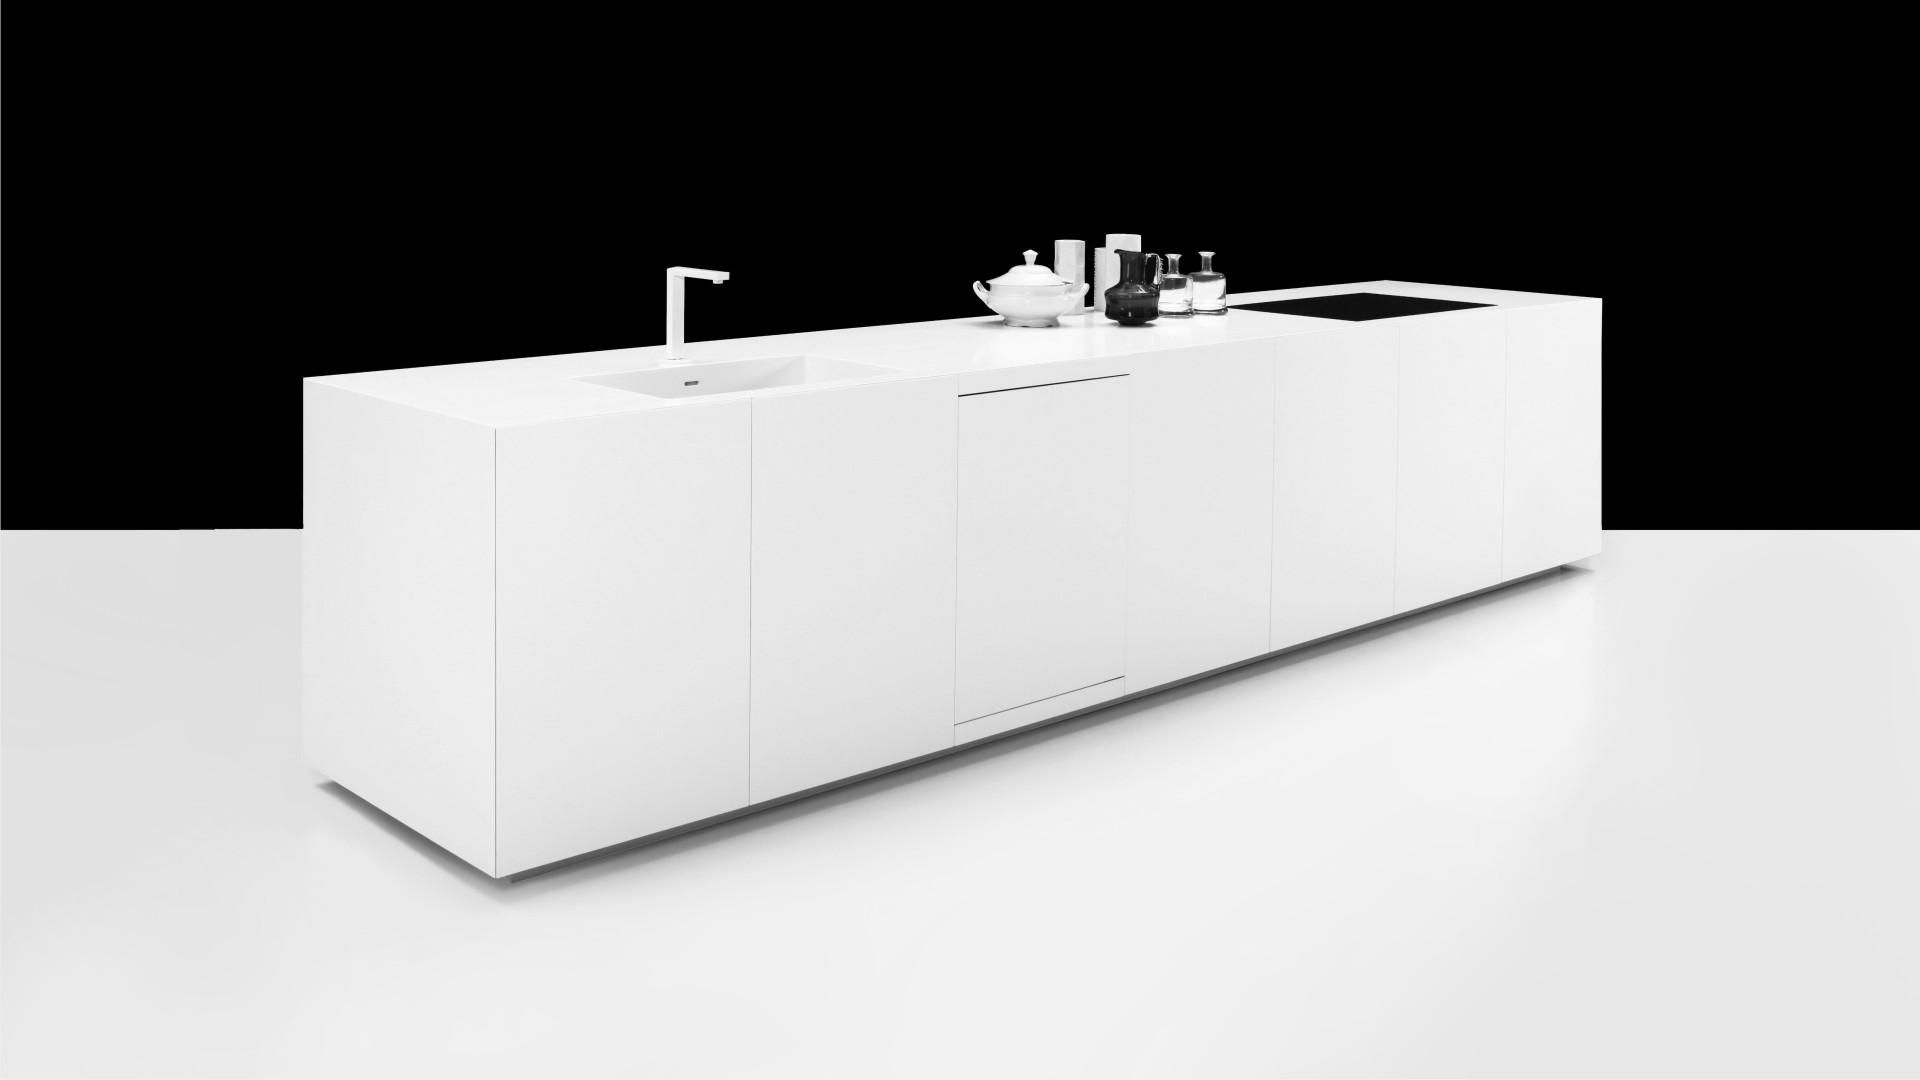 Design Cube Keuken : Showroomuitverkoop.nl designer nuuun cube kitchen island full